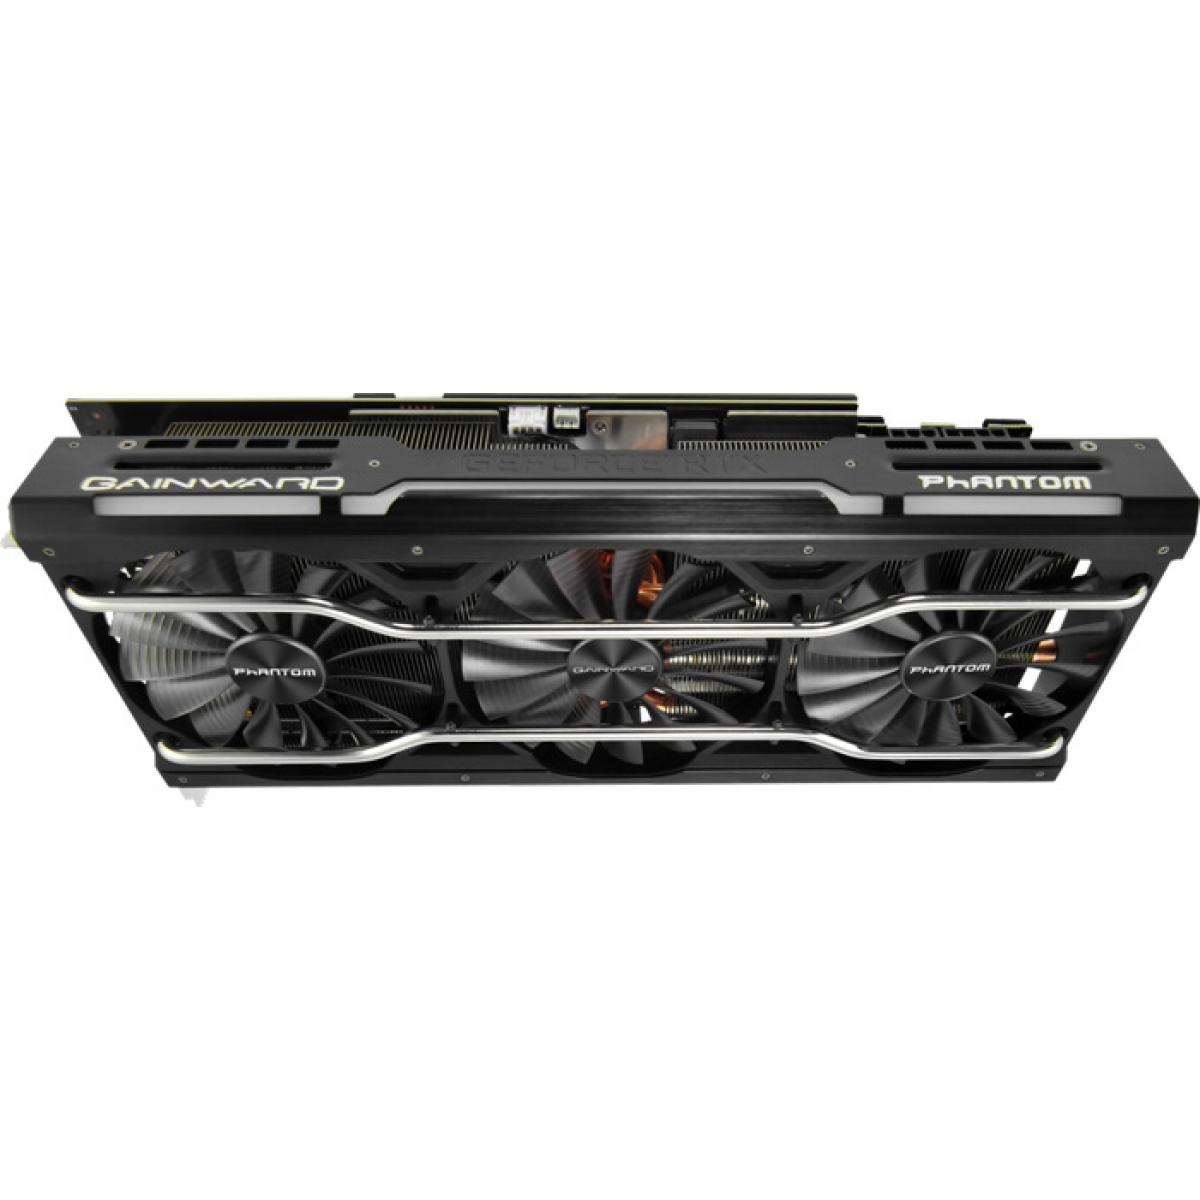 Placa De Vídeo Gainward Geforce RTX 2070 Phantom, 8GB GDDR6, 256Bit